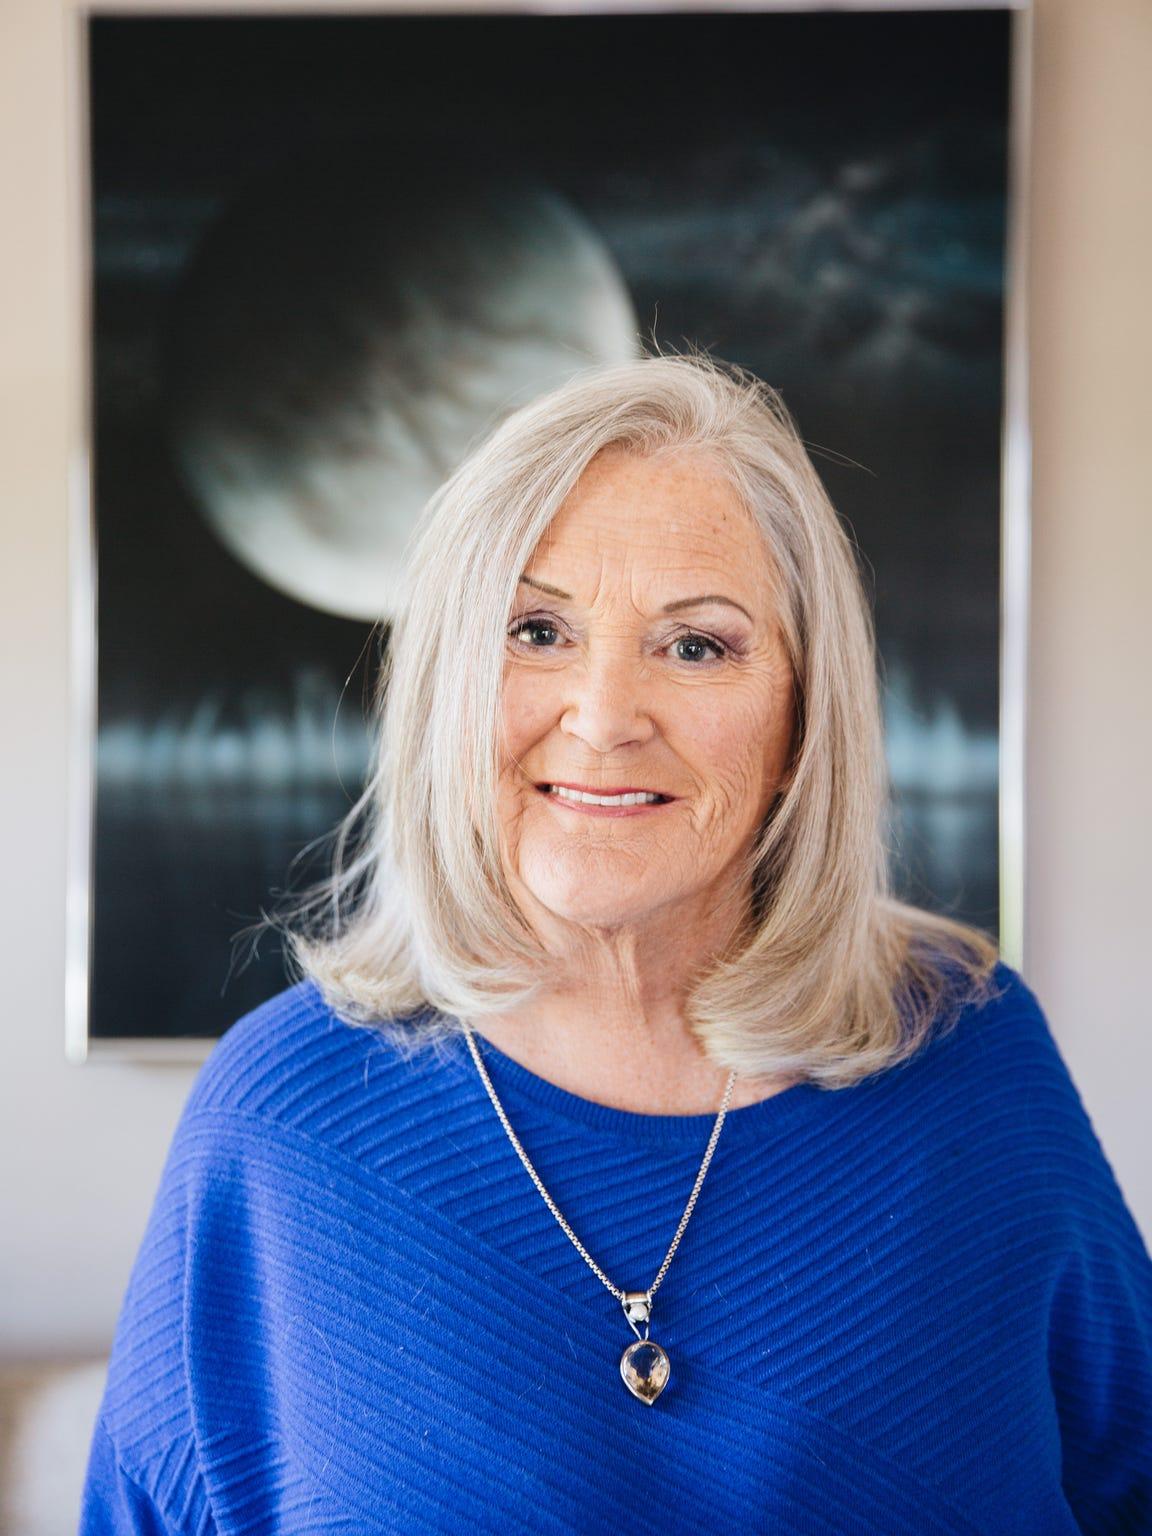 Astrologer Sherryl Nova in her home